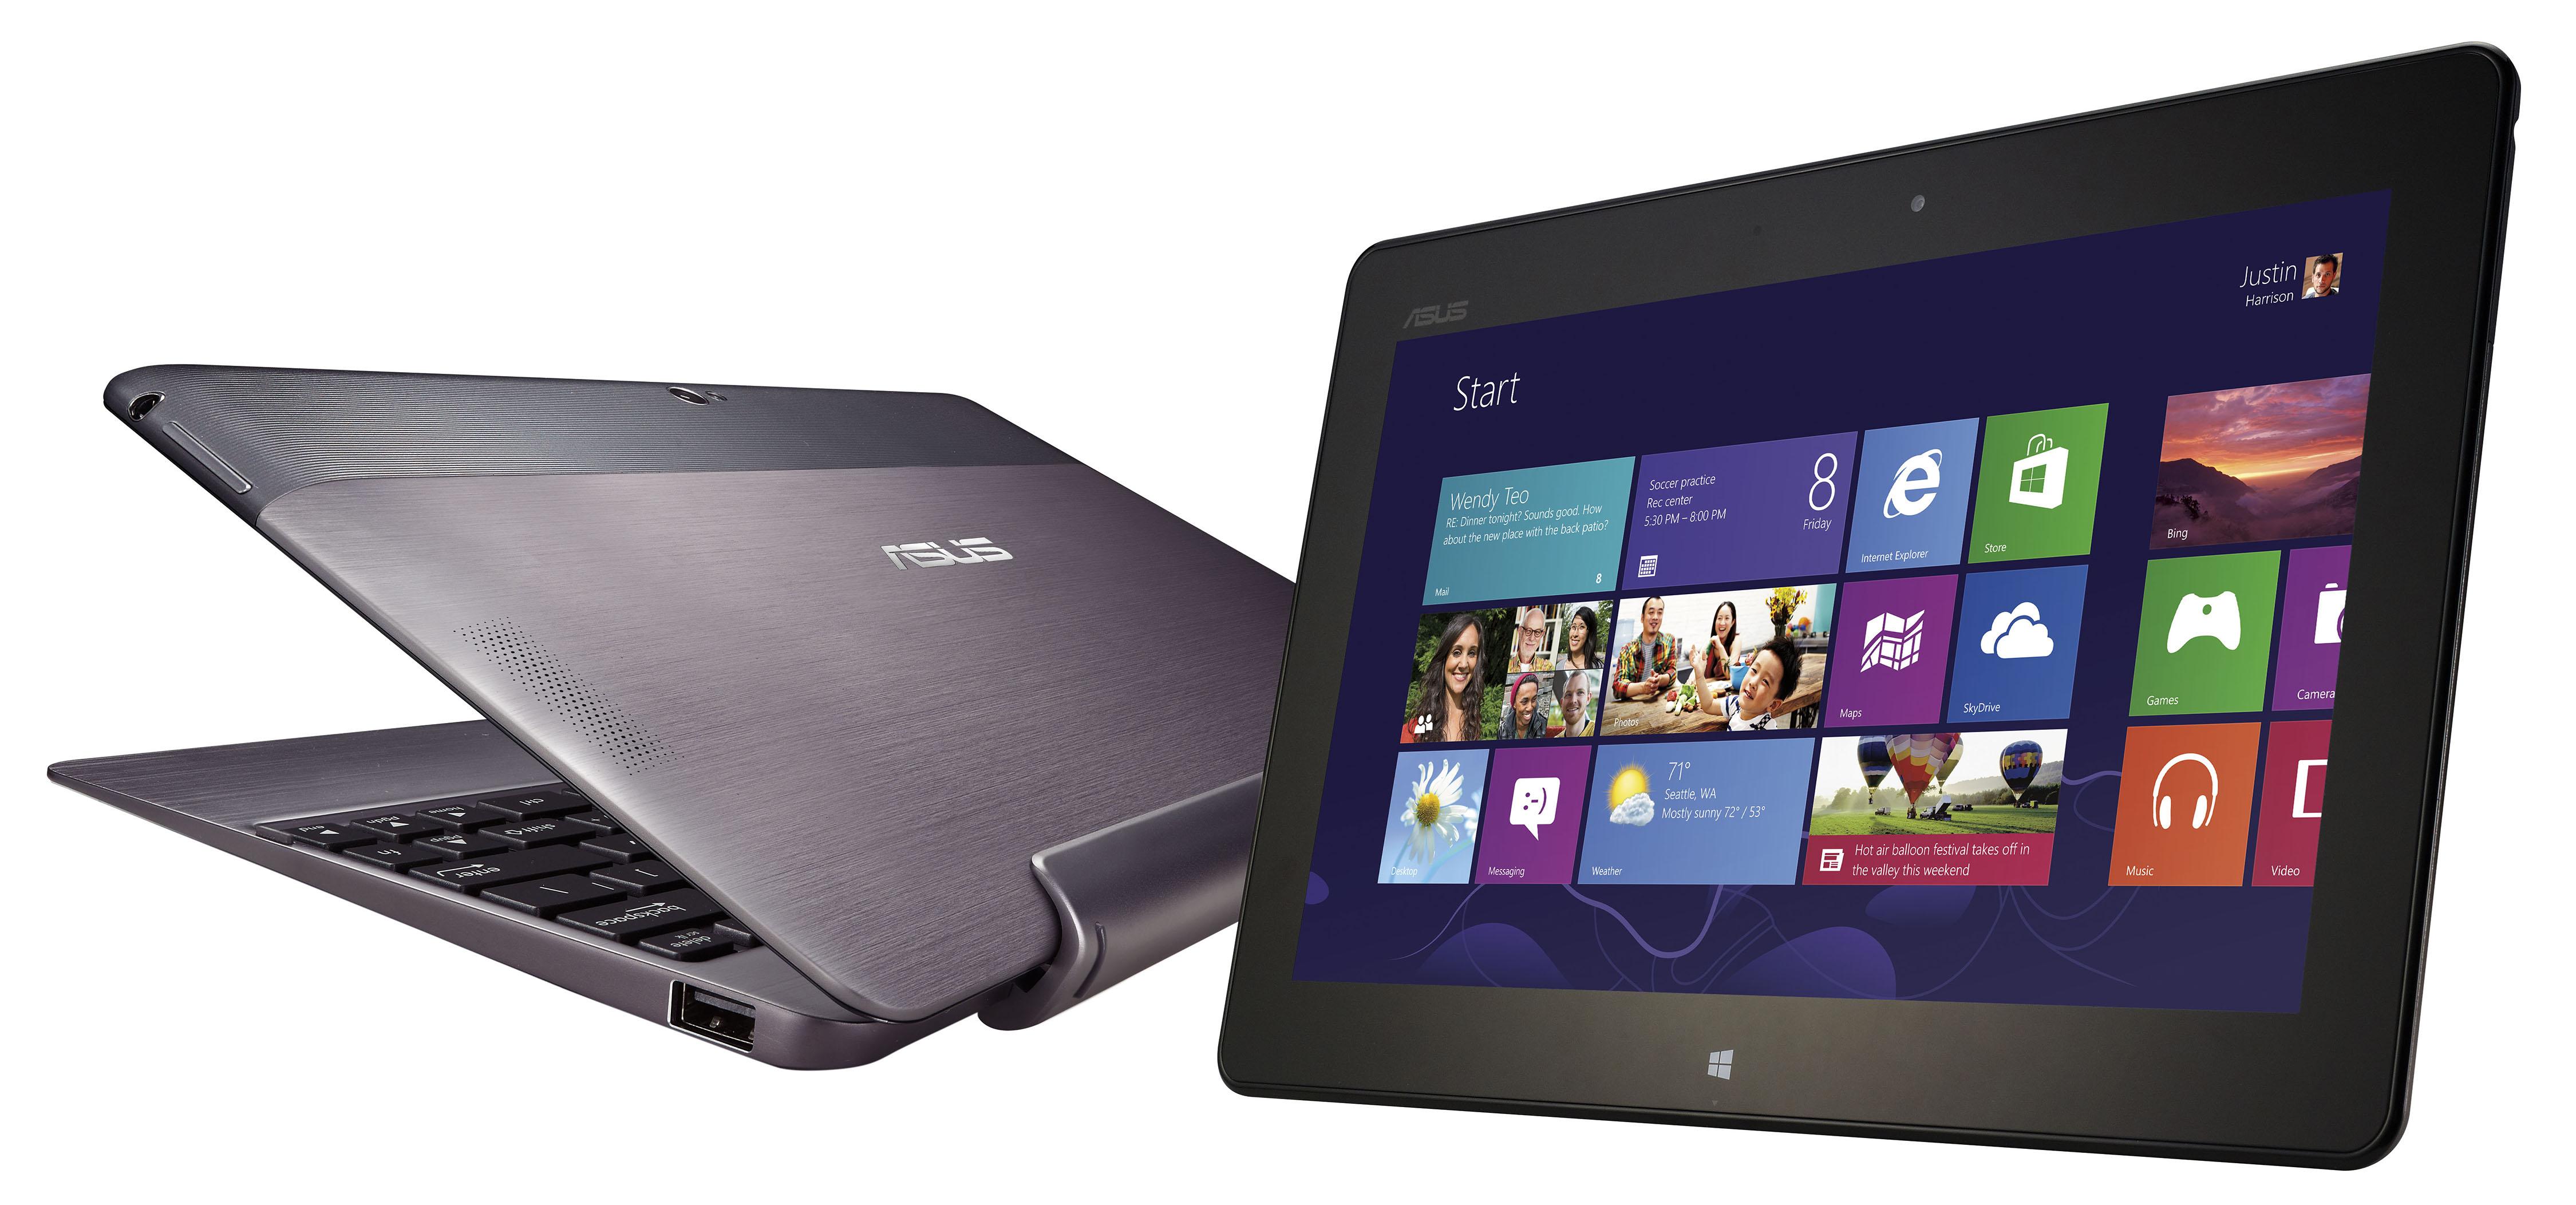 ASUS TF600T VivoTab price in Pakistan, Asus in Pakistan at ...